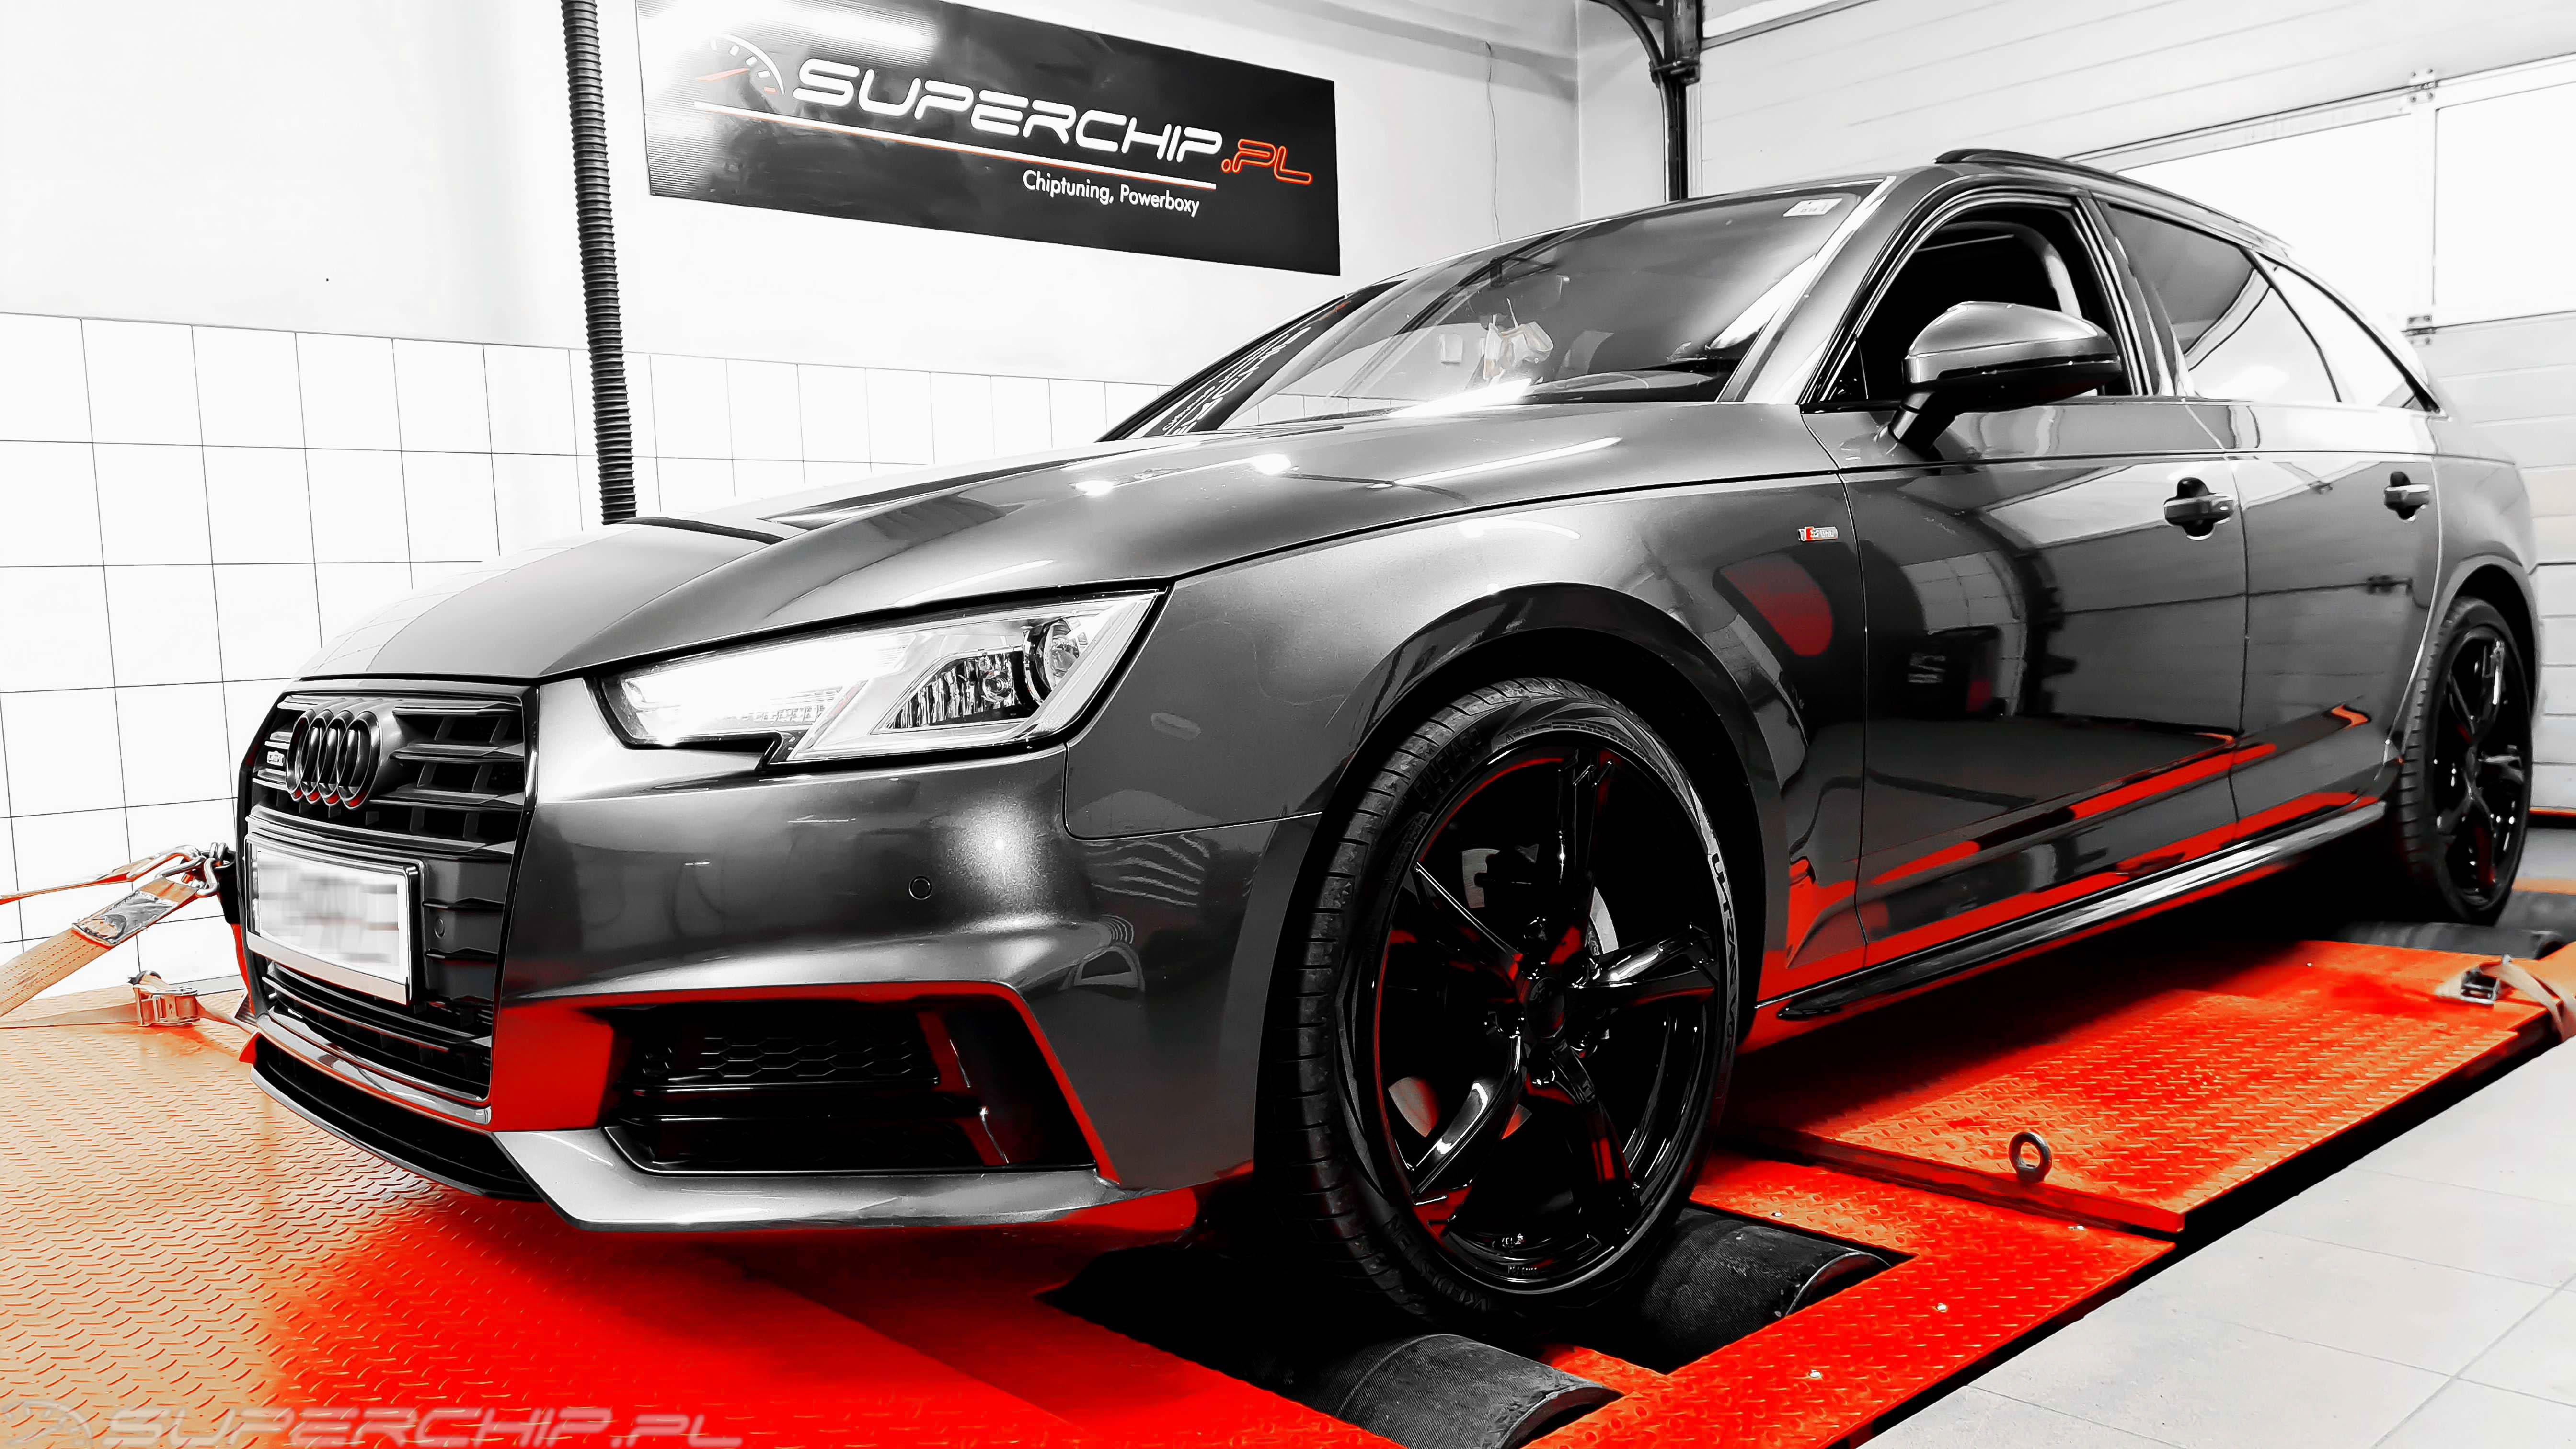 Audi A4 2.0 Tdi 190 ps chiptuning